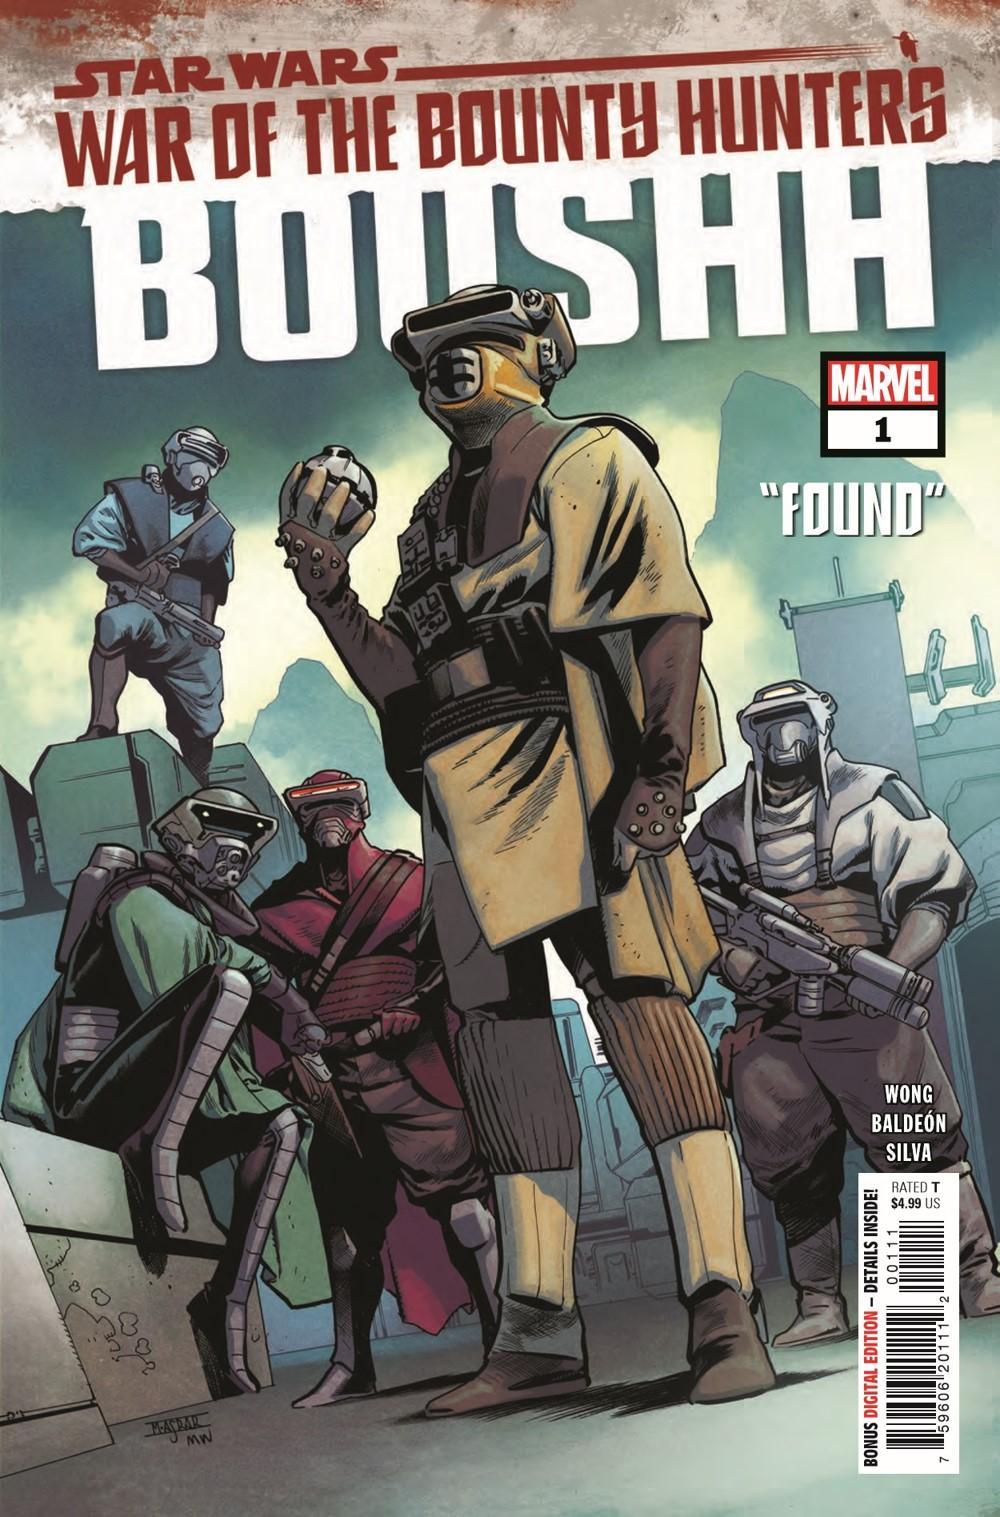 STWWAROTBHBOUSHH2021001_Preview-1 ComicList Previews: STAR WARS WAR OF THE BOUNTY HUNTERS BOUSHH #1